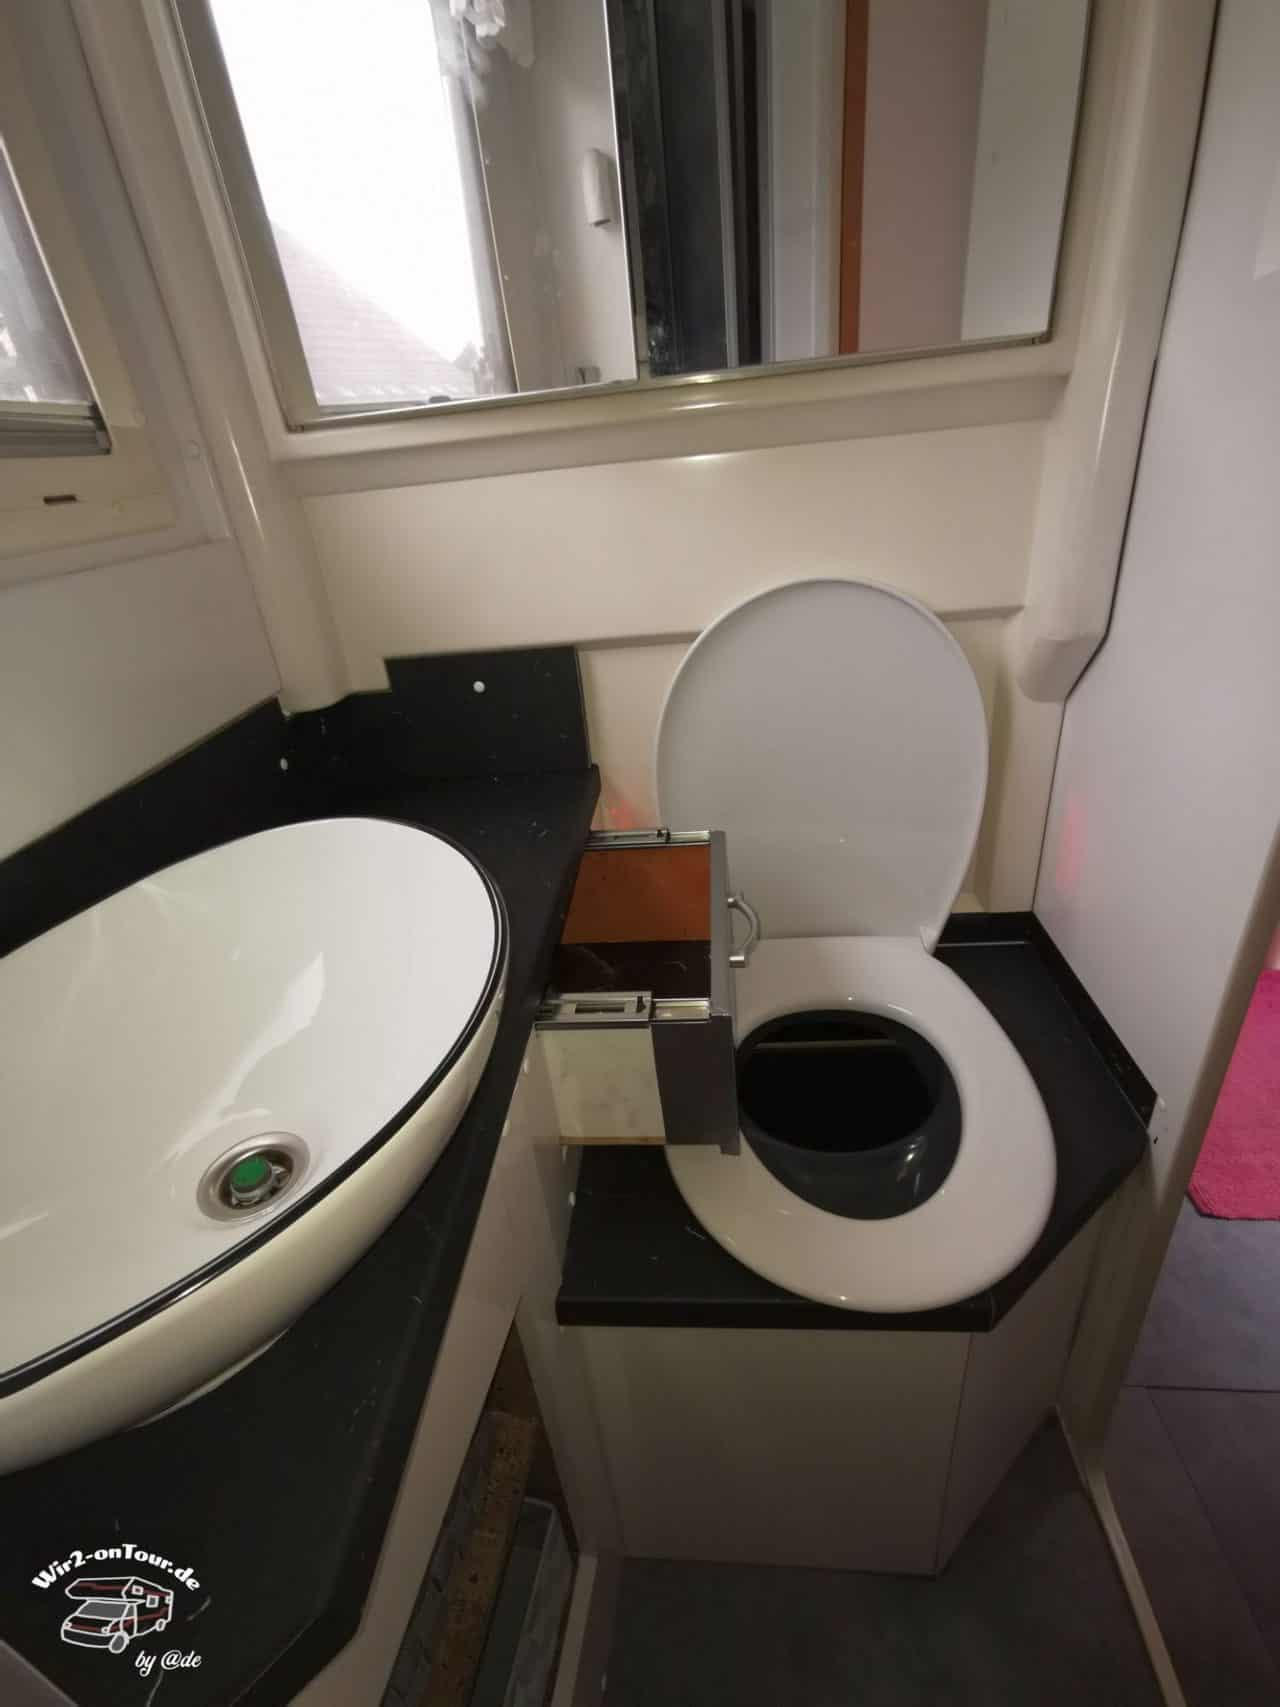 wc-fertig_007